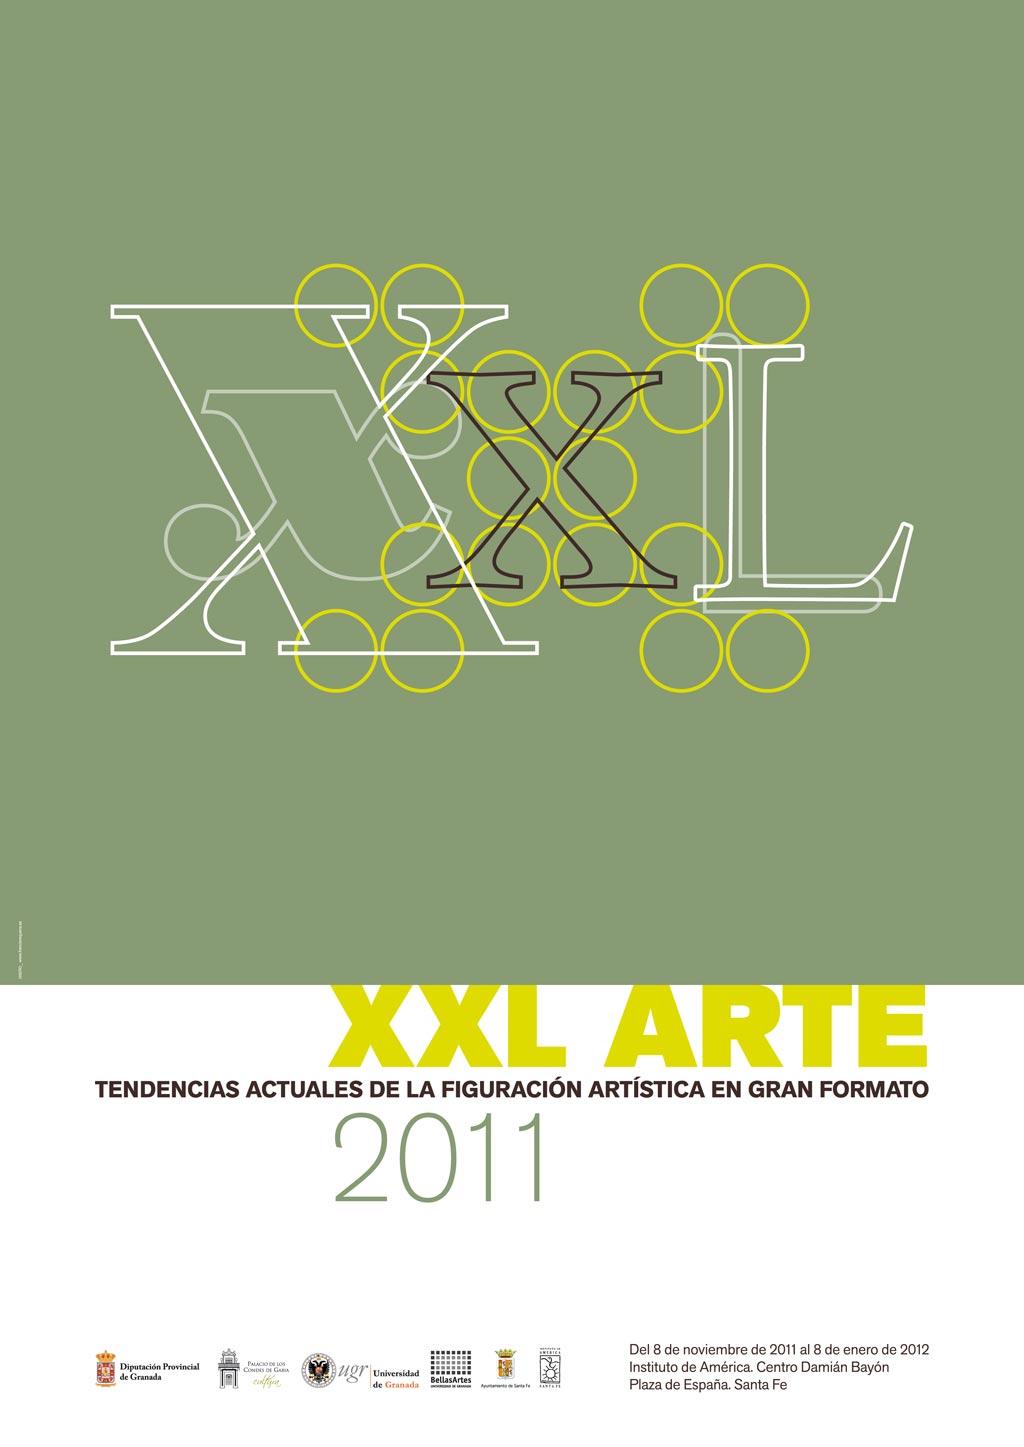 XXL_CARTEL_2011